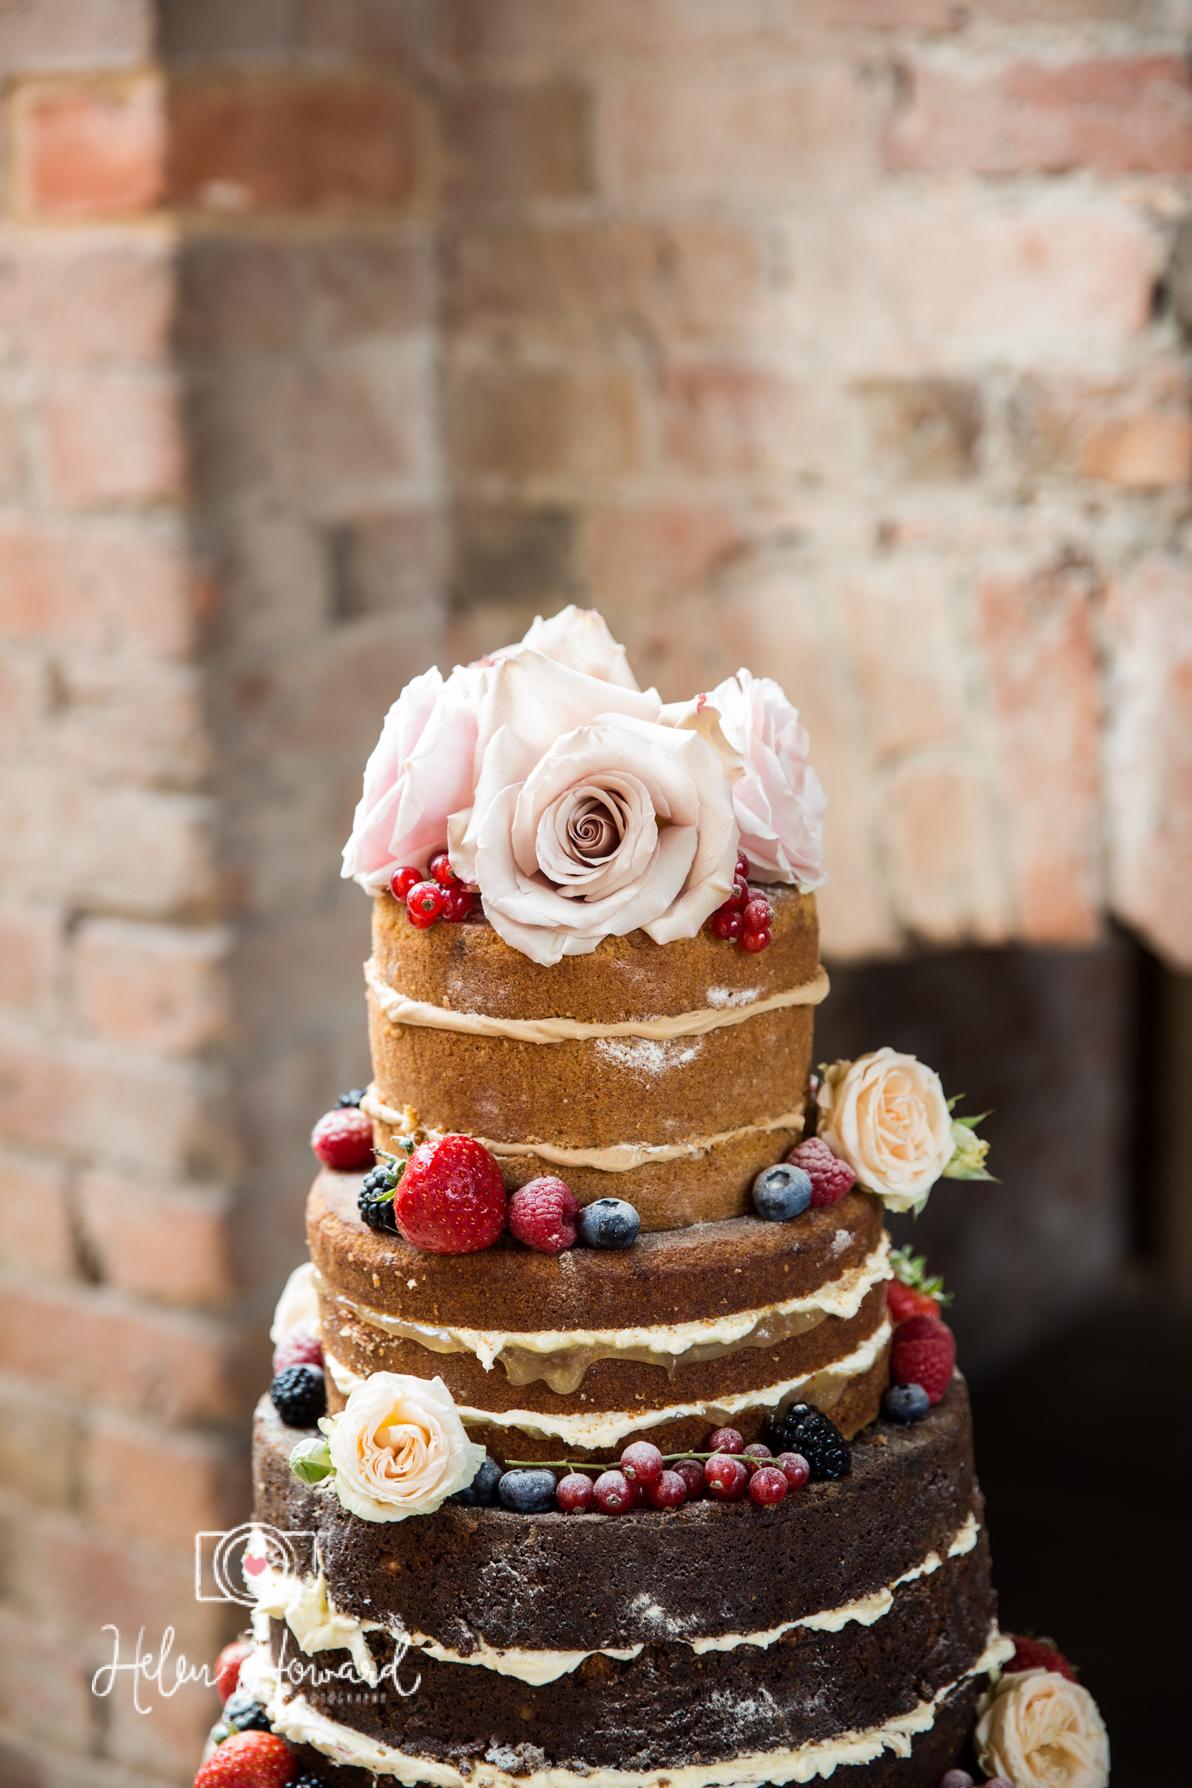 Shustoke Farm Barns Wedding Photography by Helen Howard-1.jpg